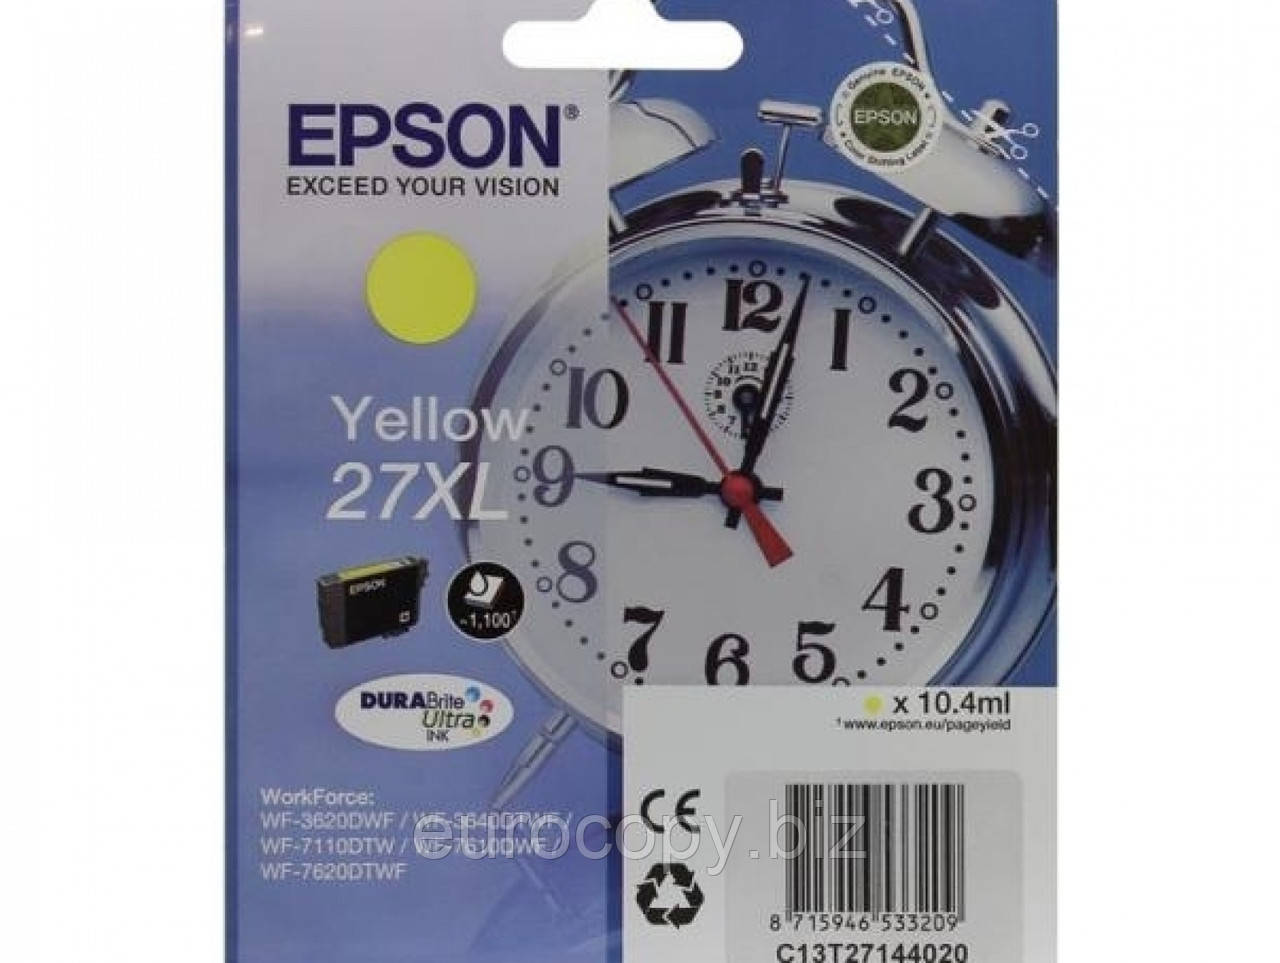 Картридж Epson WF7110 Yellow (C13T27144022)